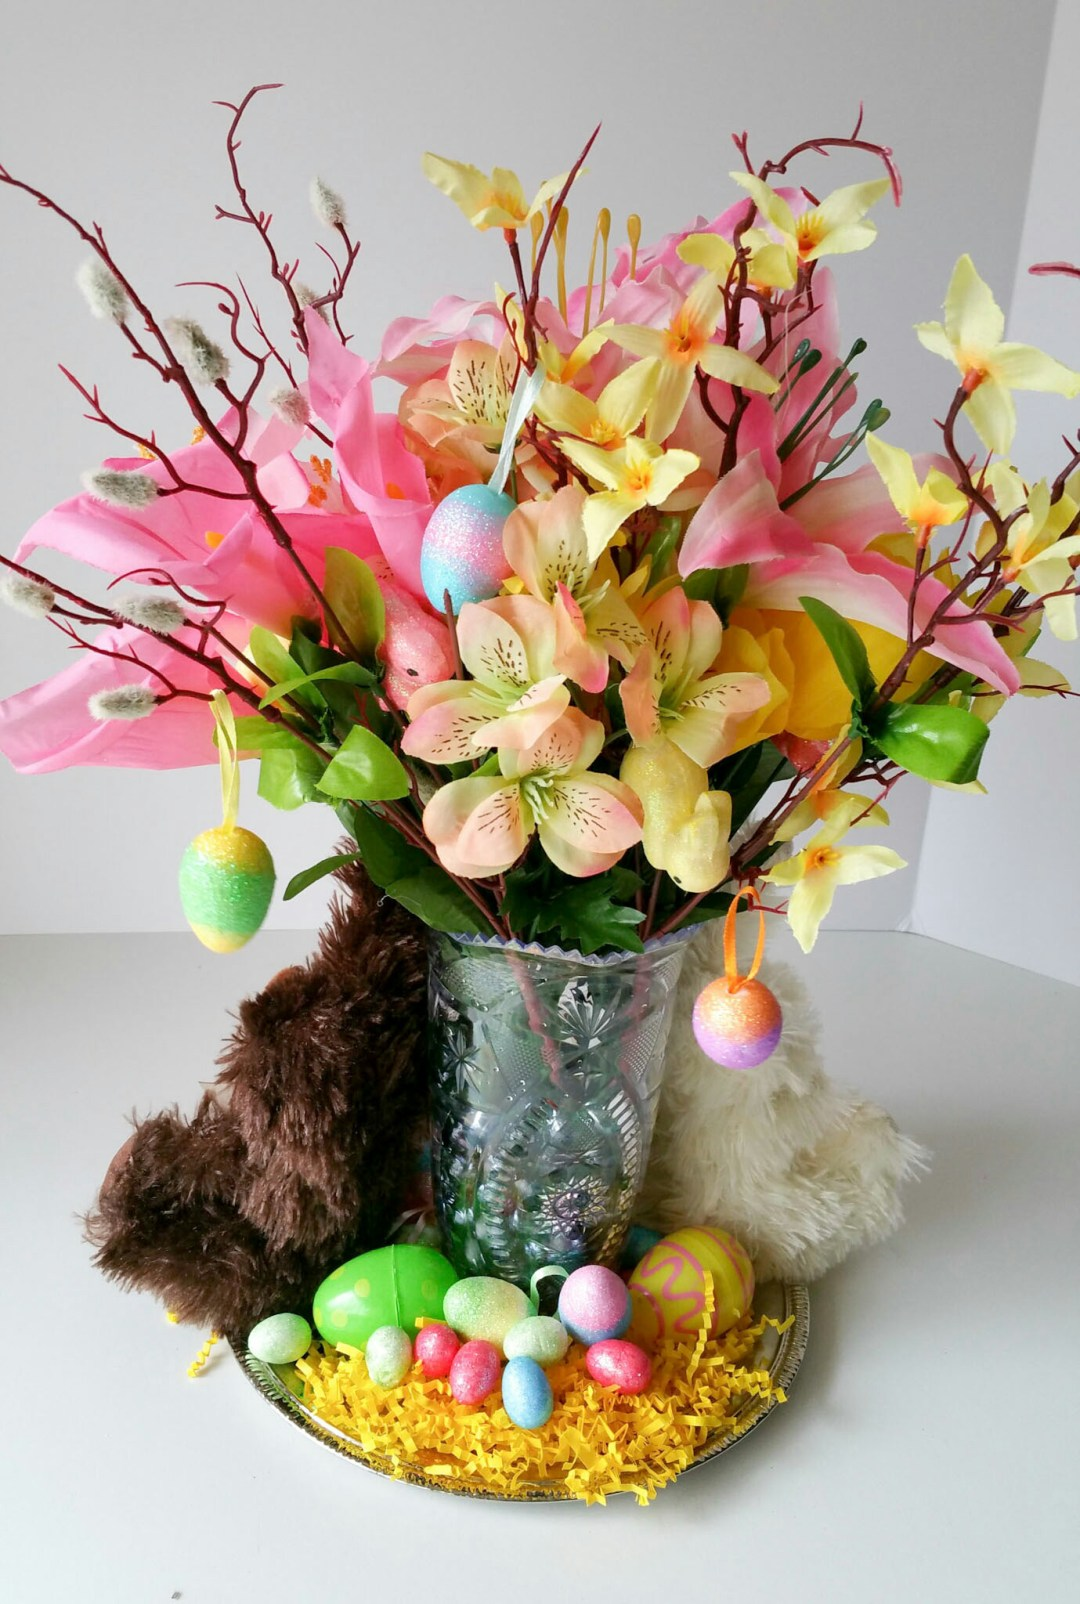 Super-Cute-Egg-Bouquet-in-6-Easy-Steps-Thirteen-LiWBF